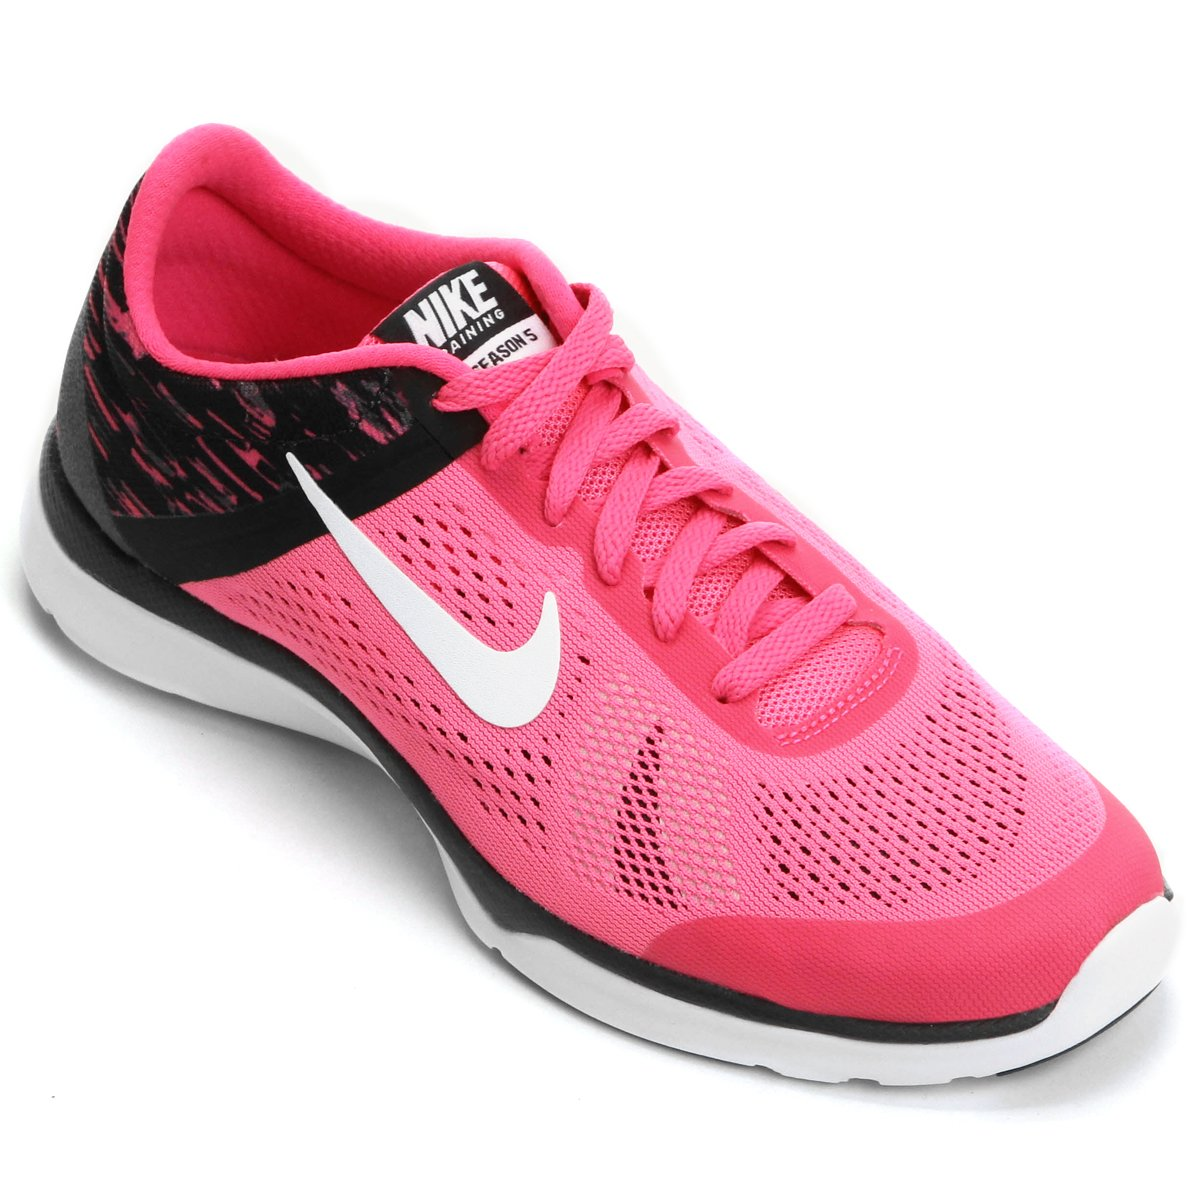 Tênis Nike In-Season Tr 5 Print Feminino - Compre Agora  d7765e63fa